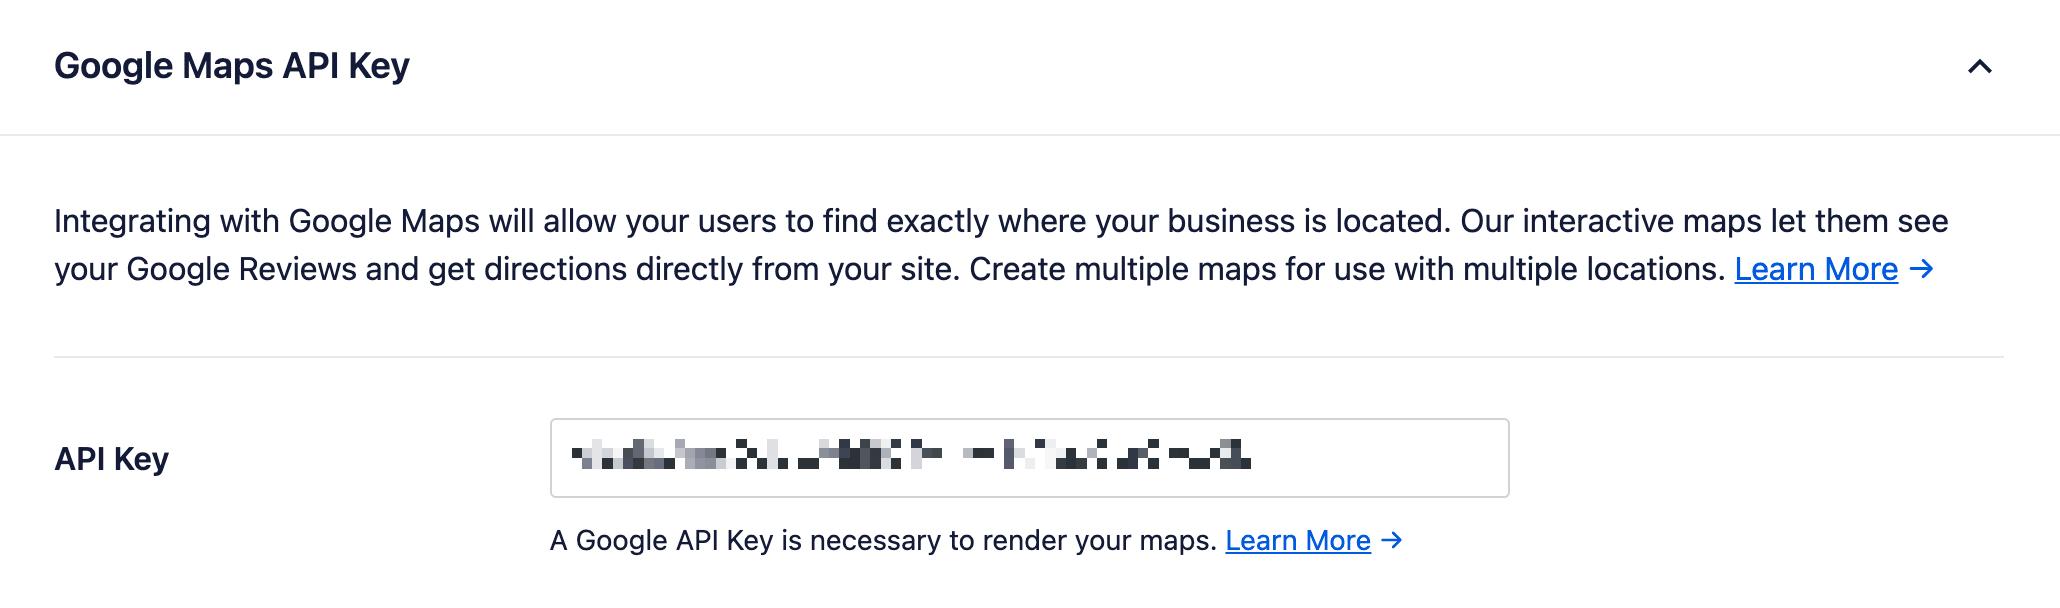 Google Maps API Key input in the API Key field